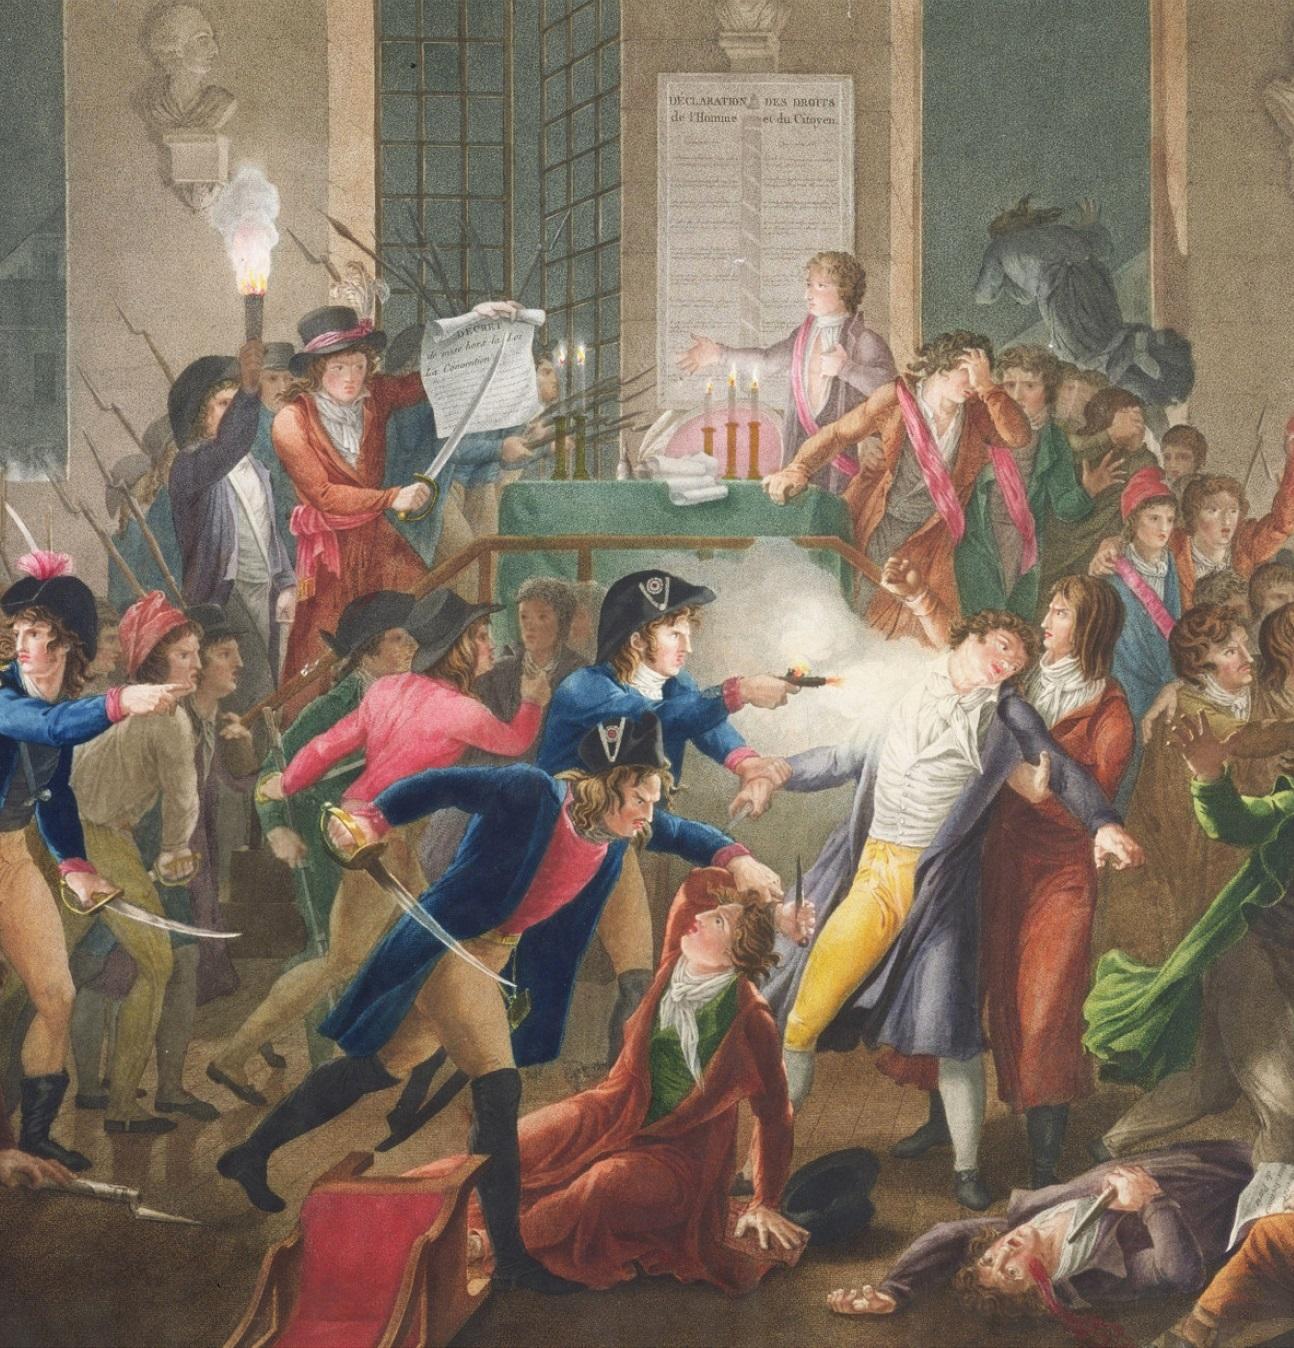 Файл:The arrest of Robespierre cropped.jpg – Уикипедия